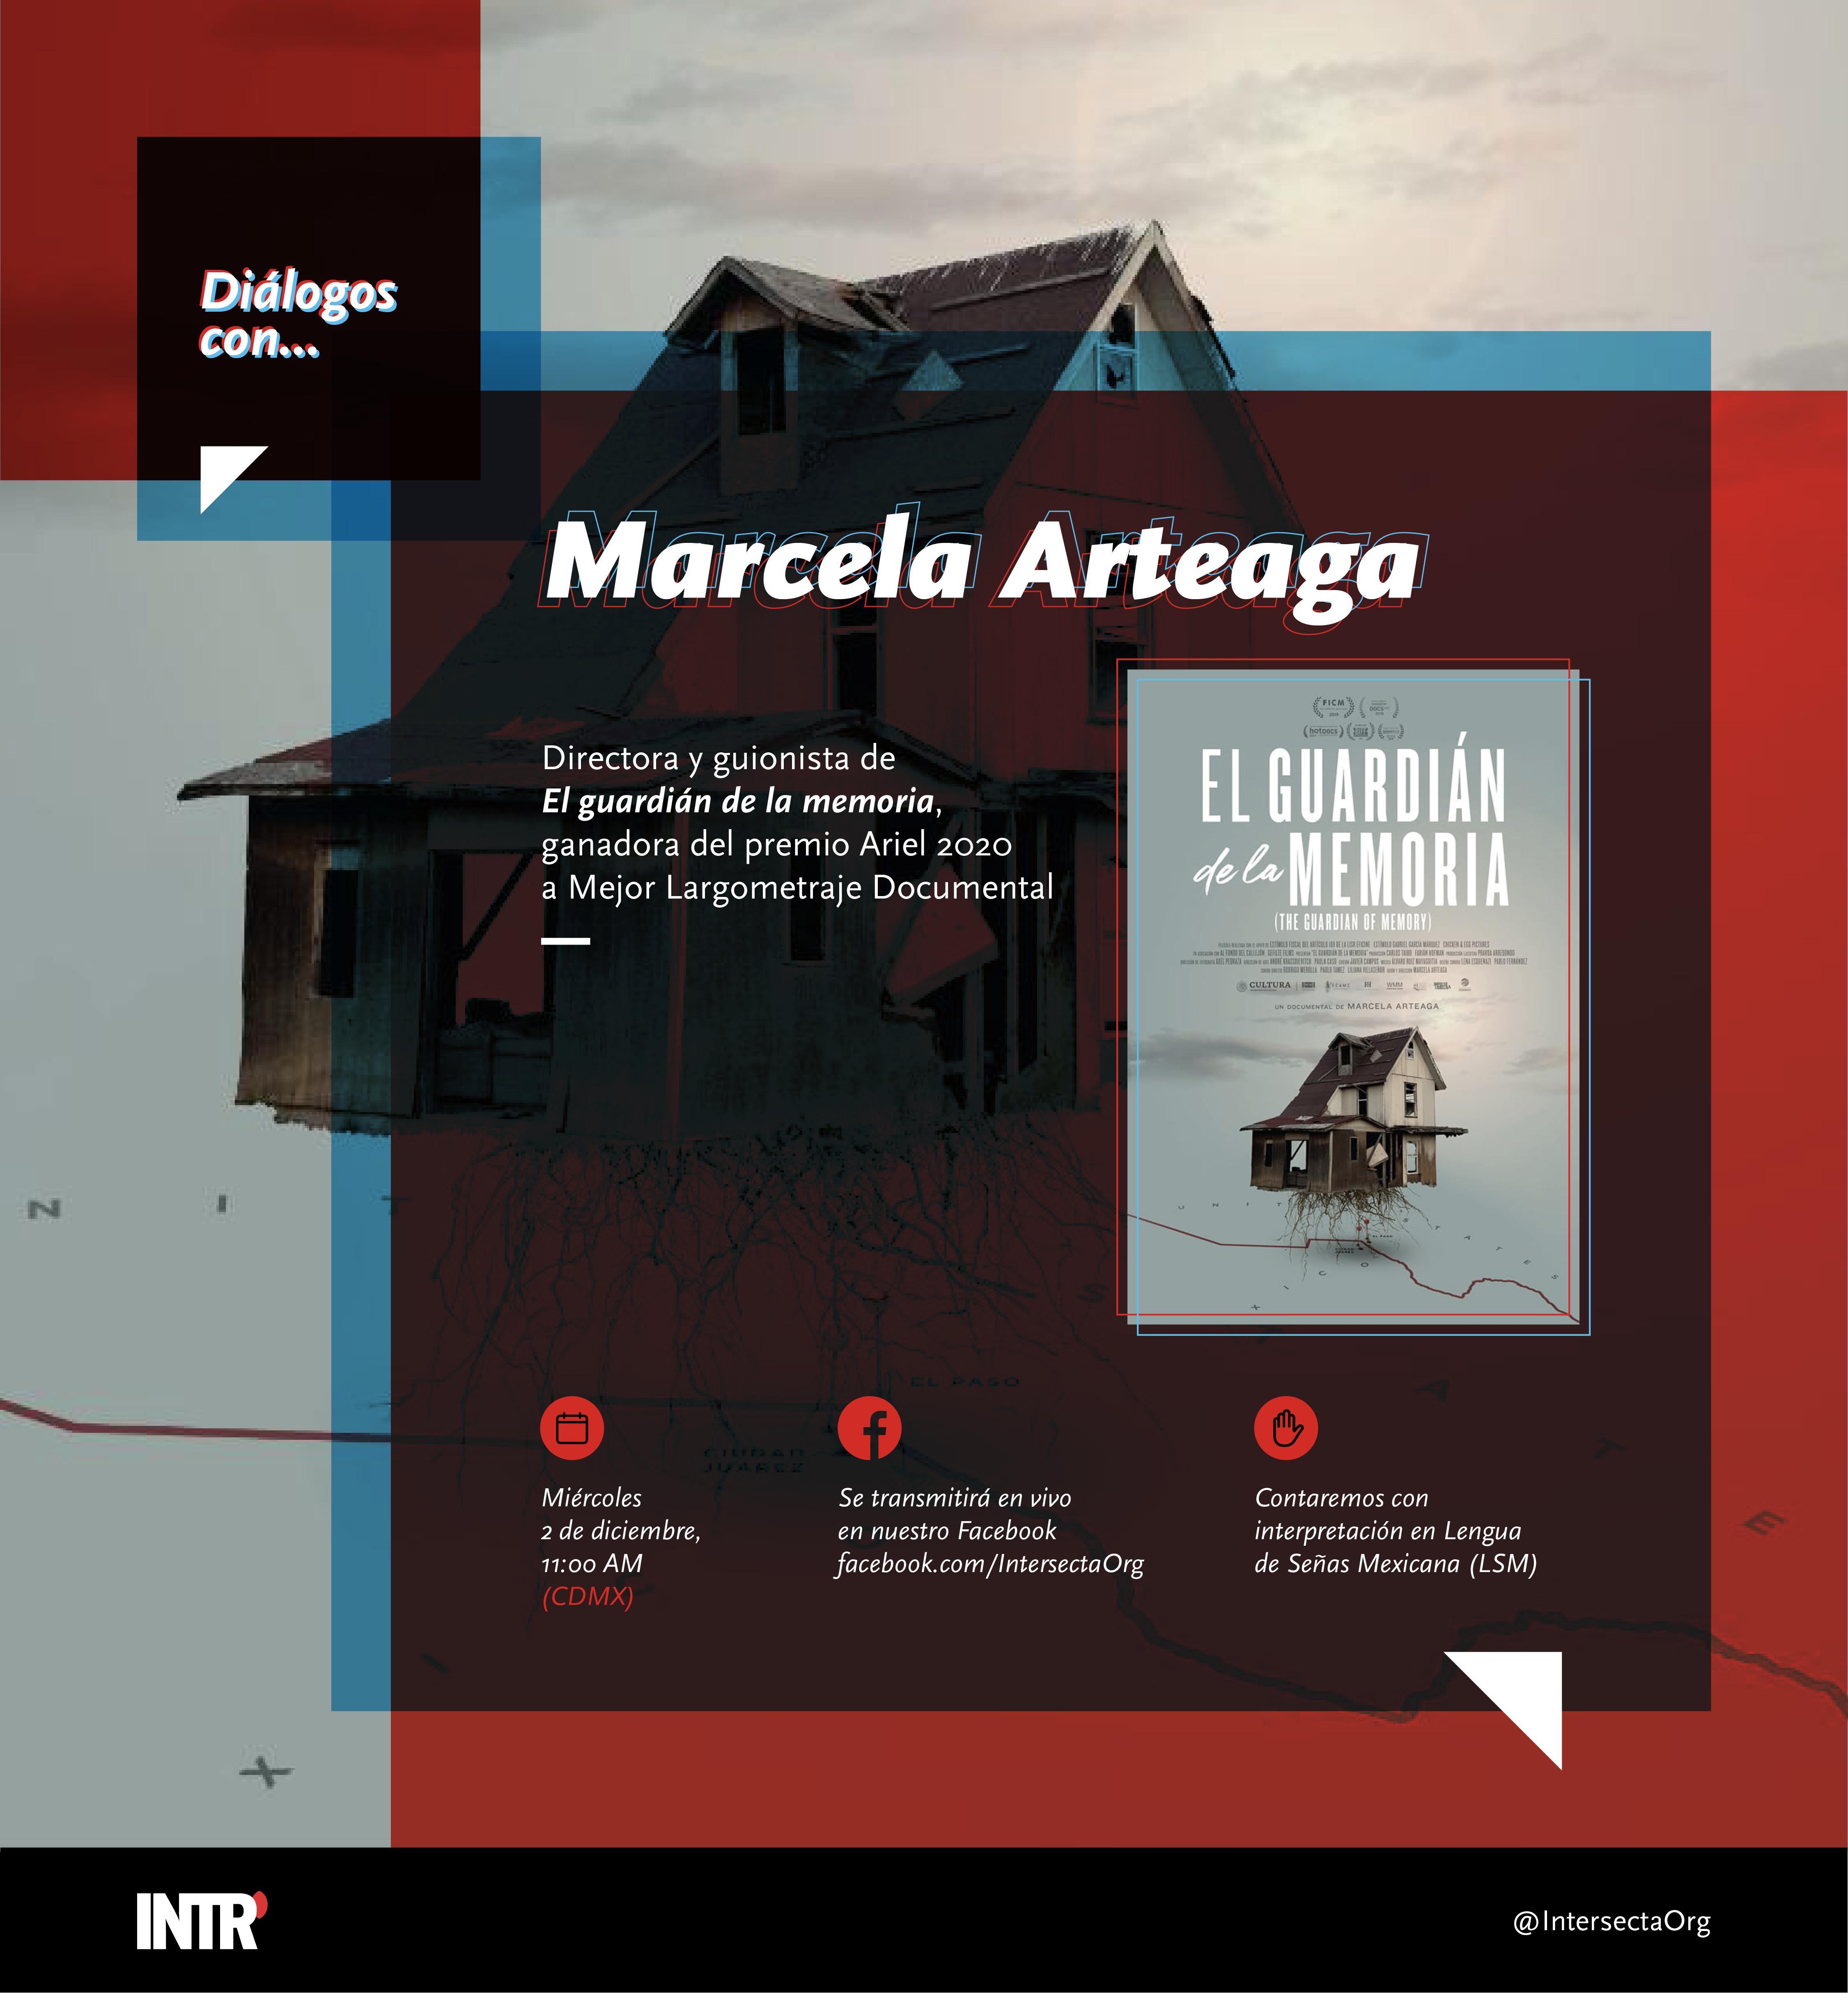 Diálogos_MarcelaArteaga